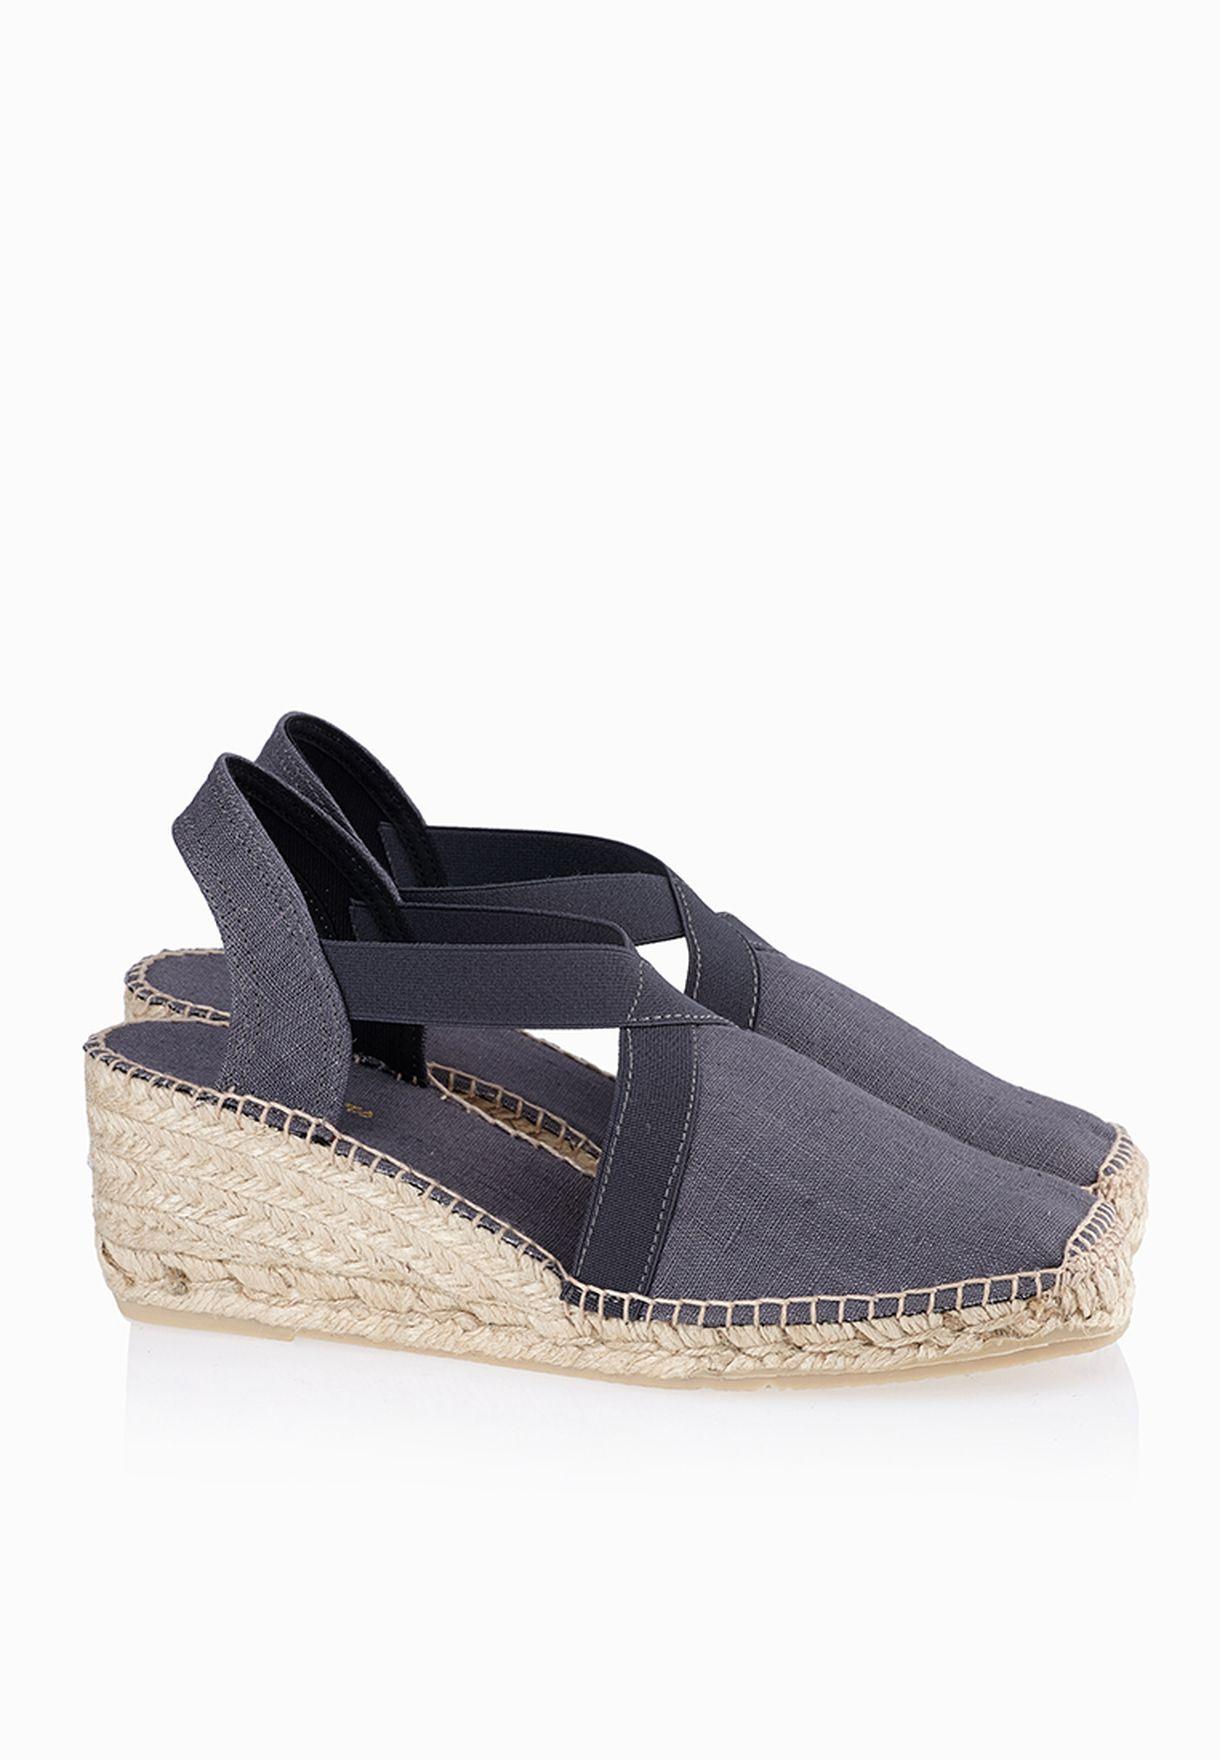 3bf9a515db1ba Shop Toni pons grey Cross Strap Espadrilles Sandals for Women in UAE ...